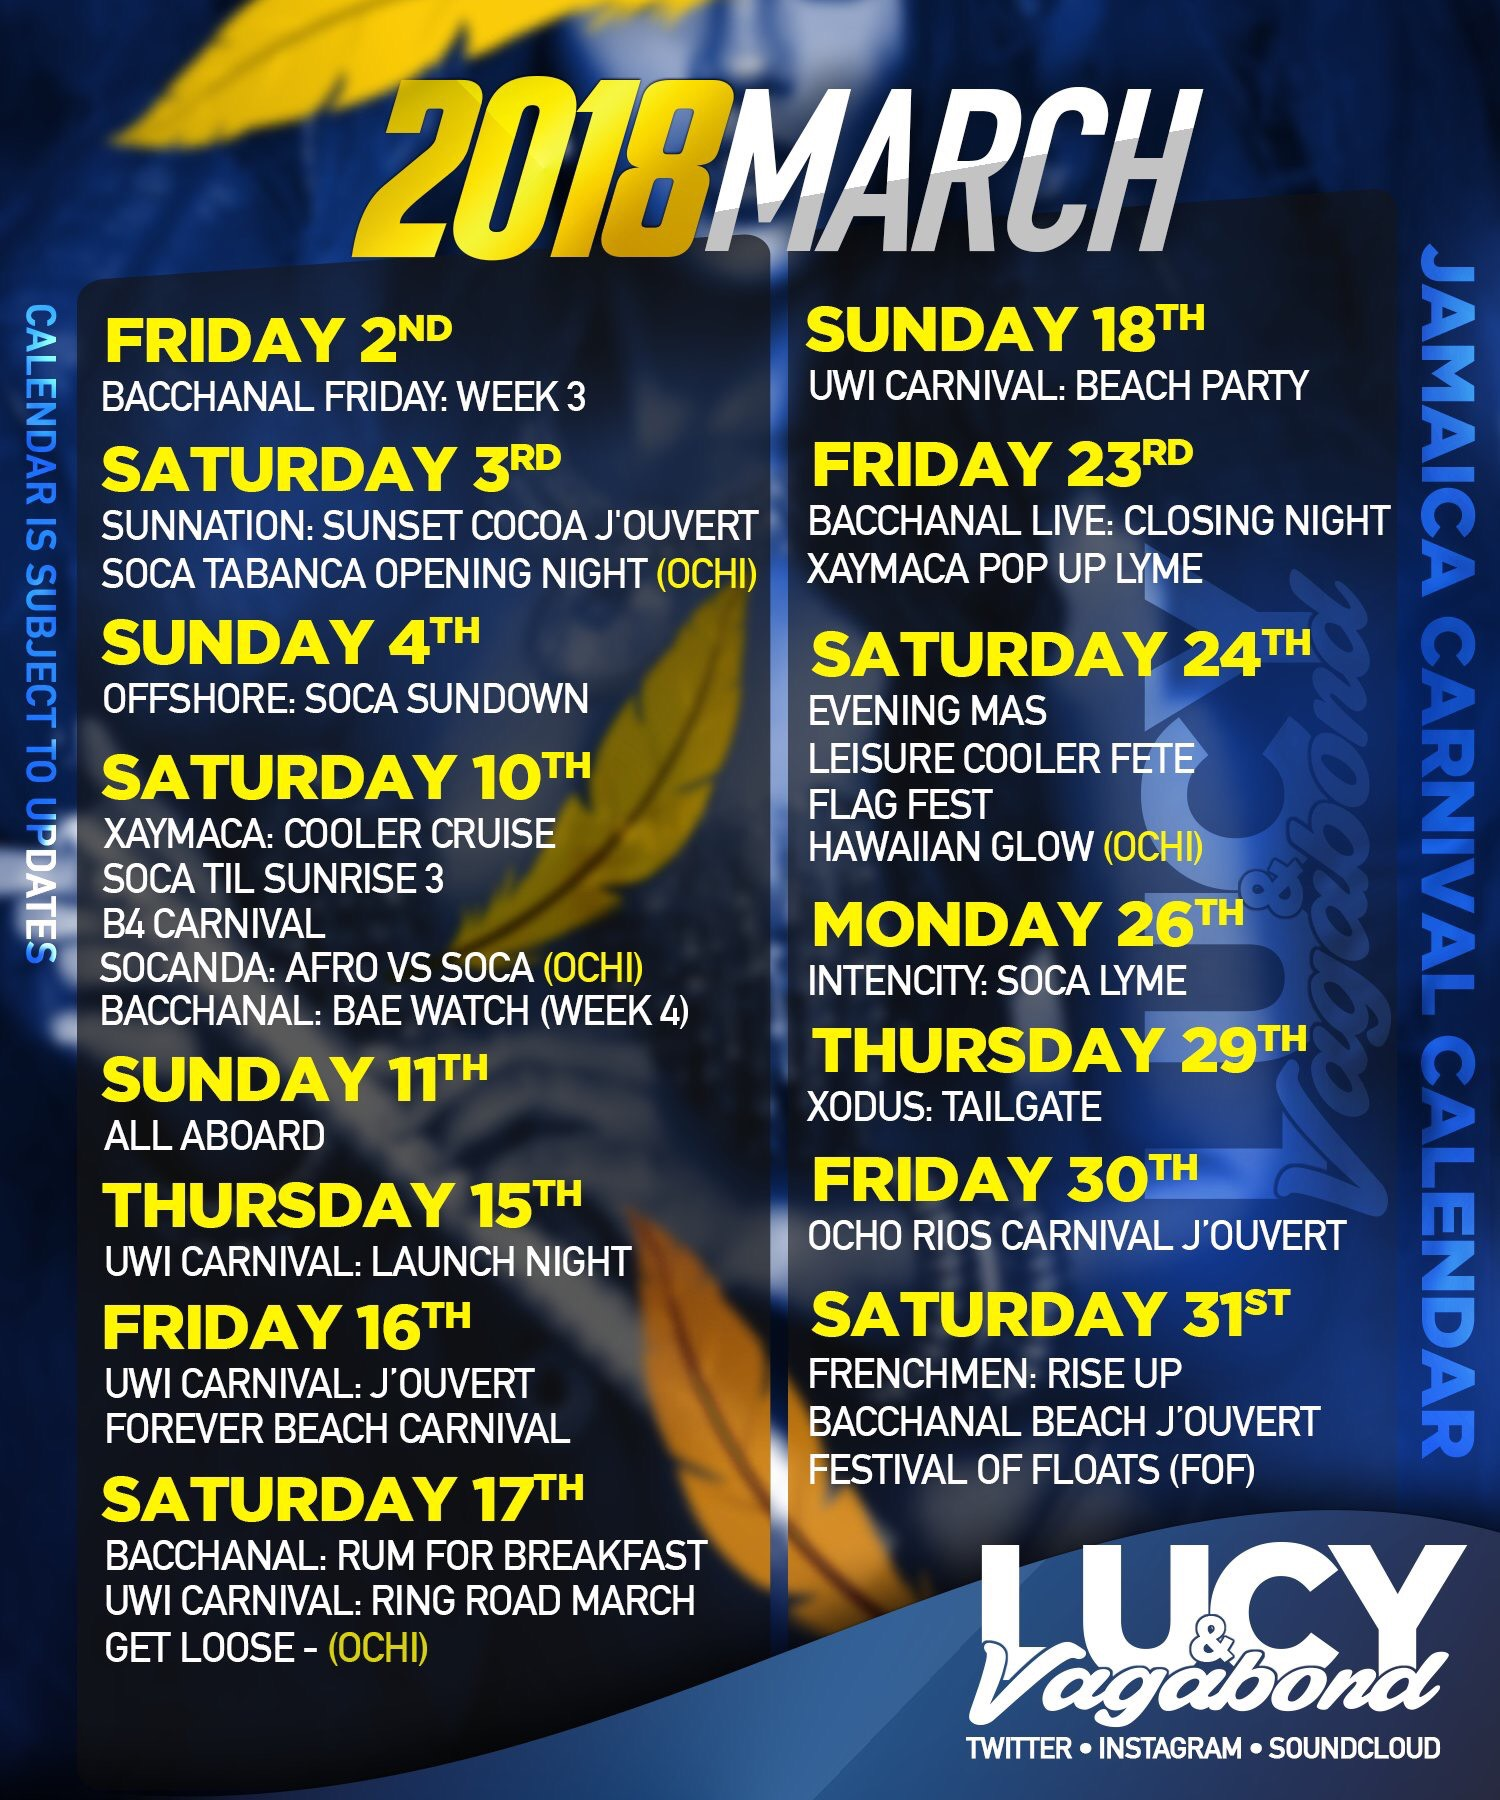 Official JA Carnival Lucy & Vagabond March Calendar